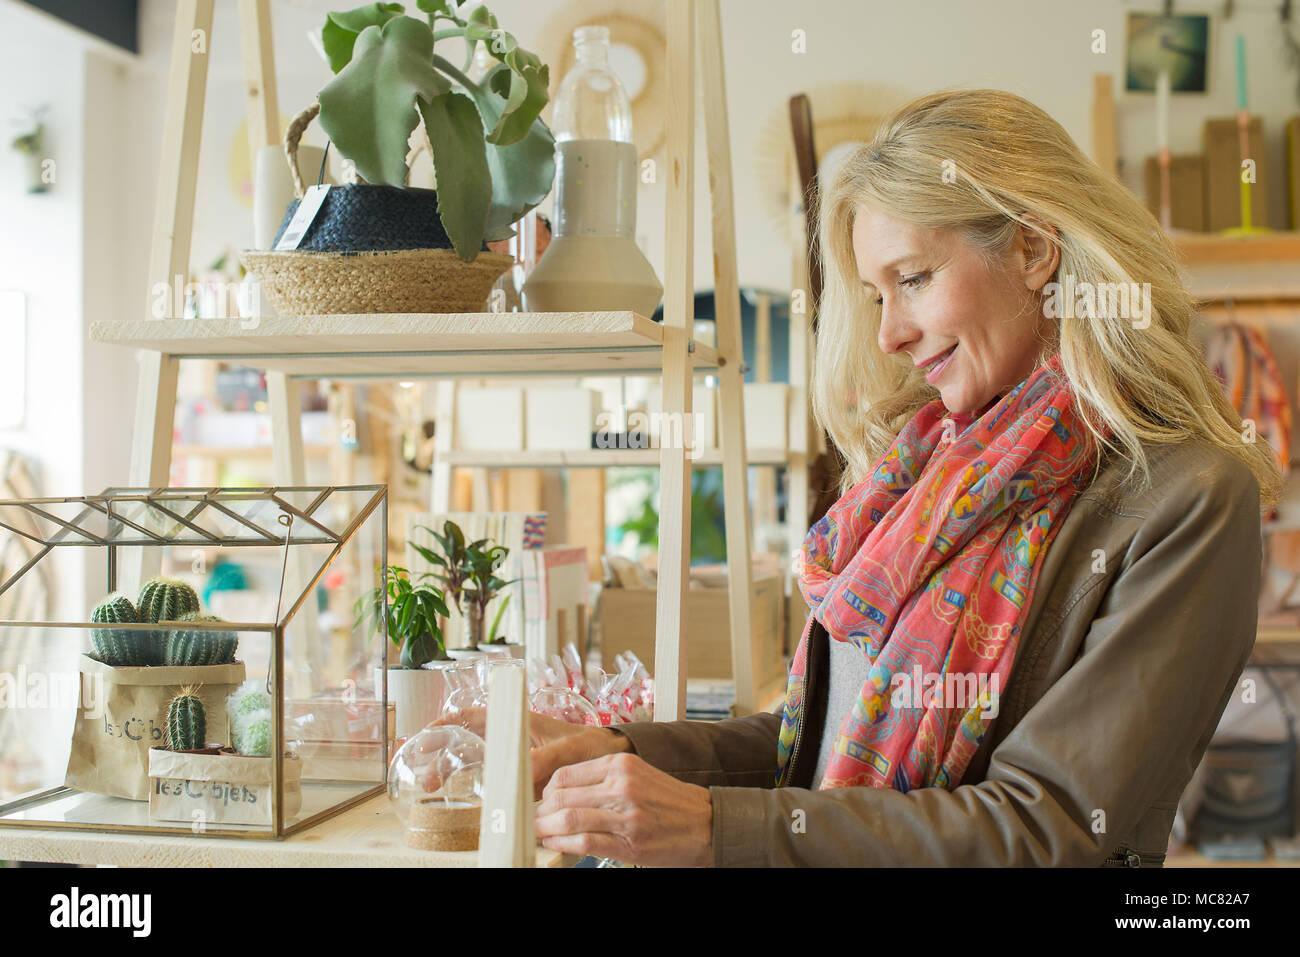 Reife Frau einkaufen in Home Dekoration store Stockbild